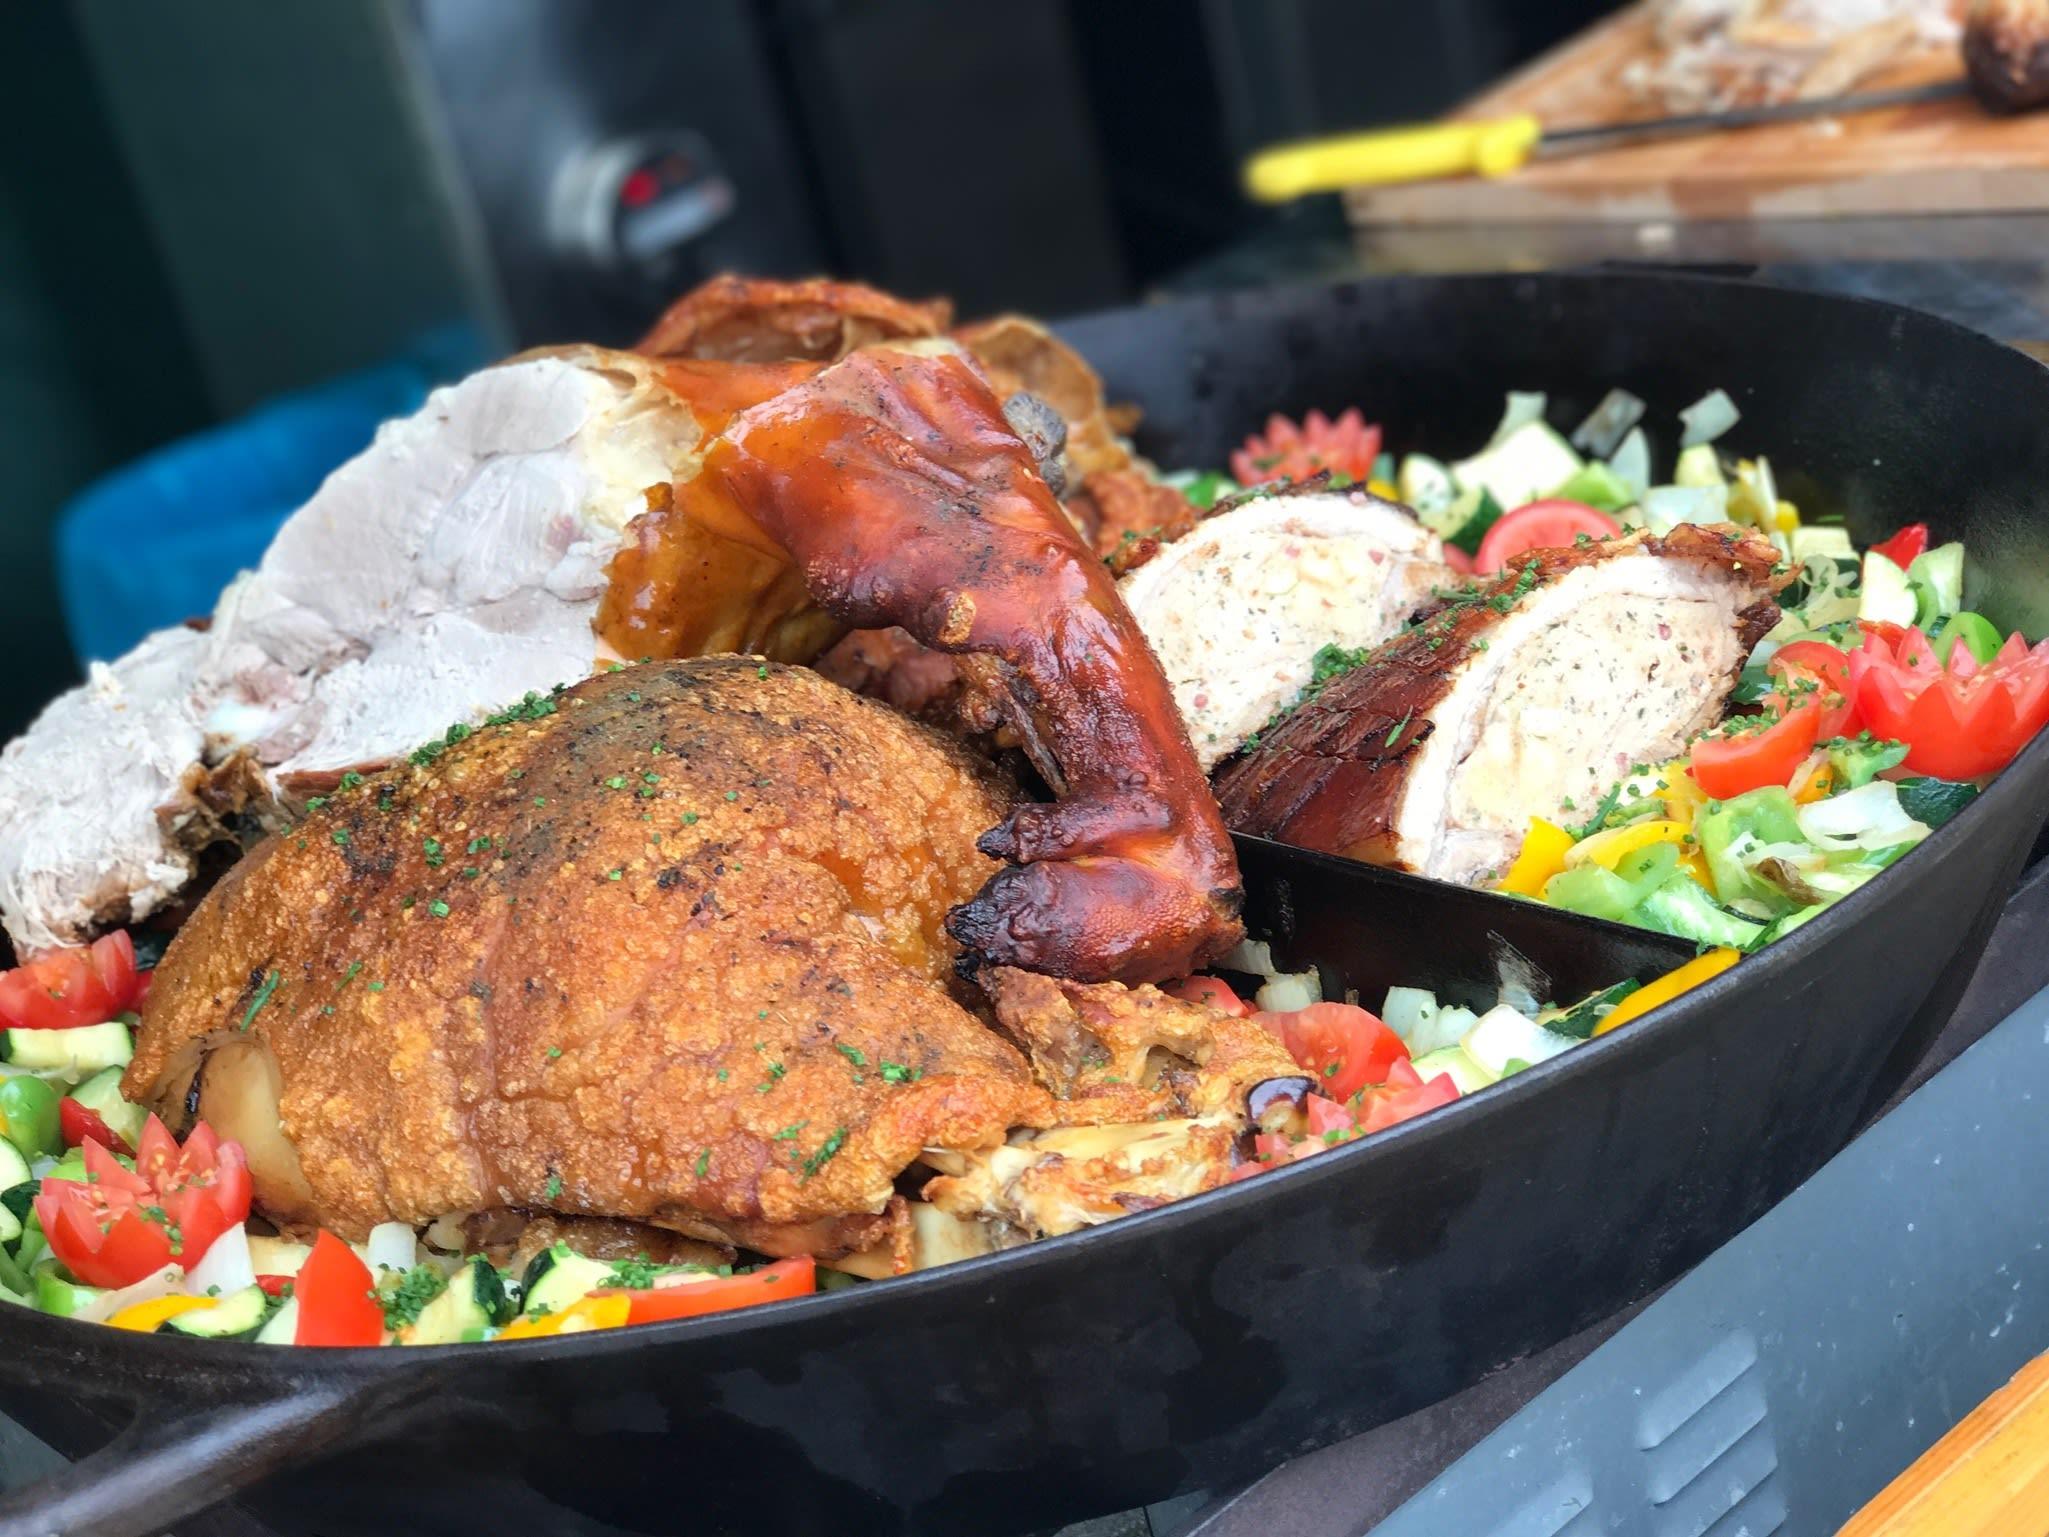 Catering Fleisch aufgeschnitten Braten